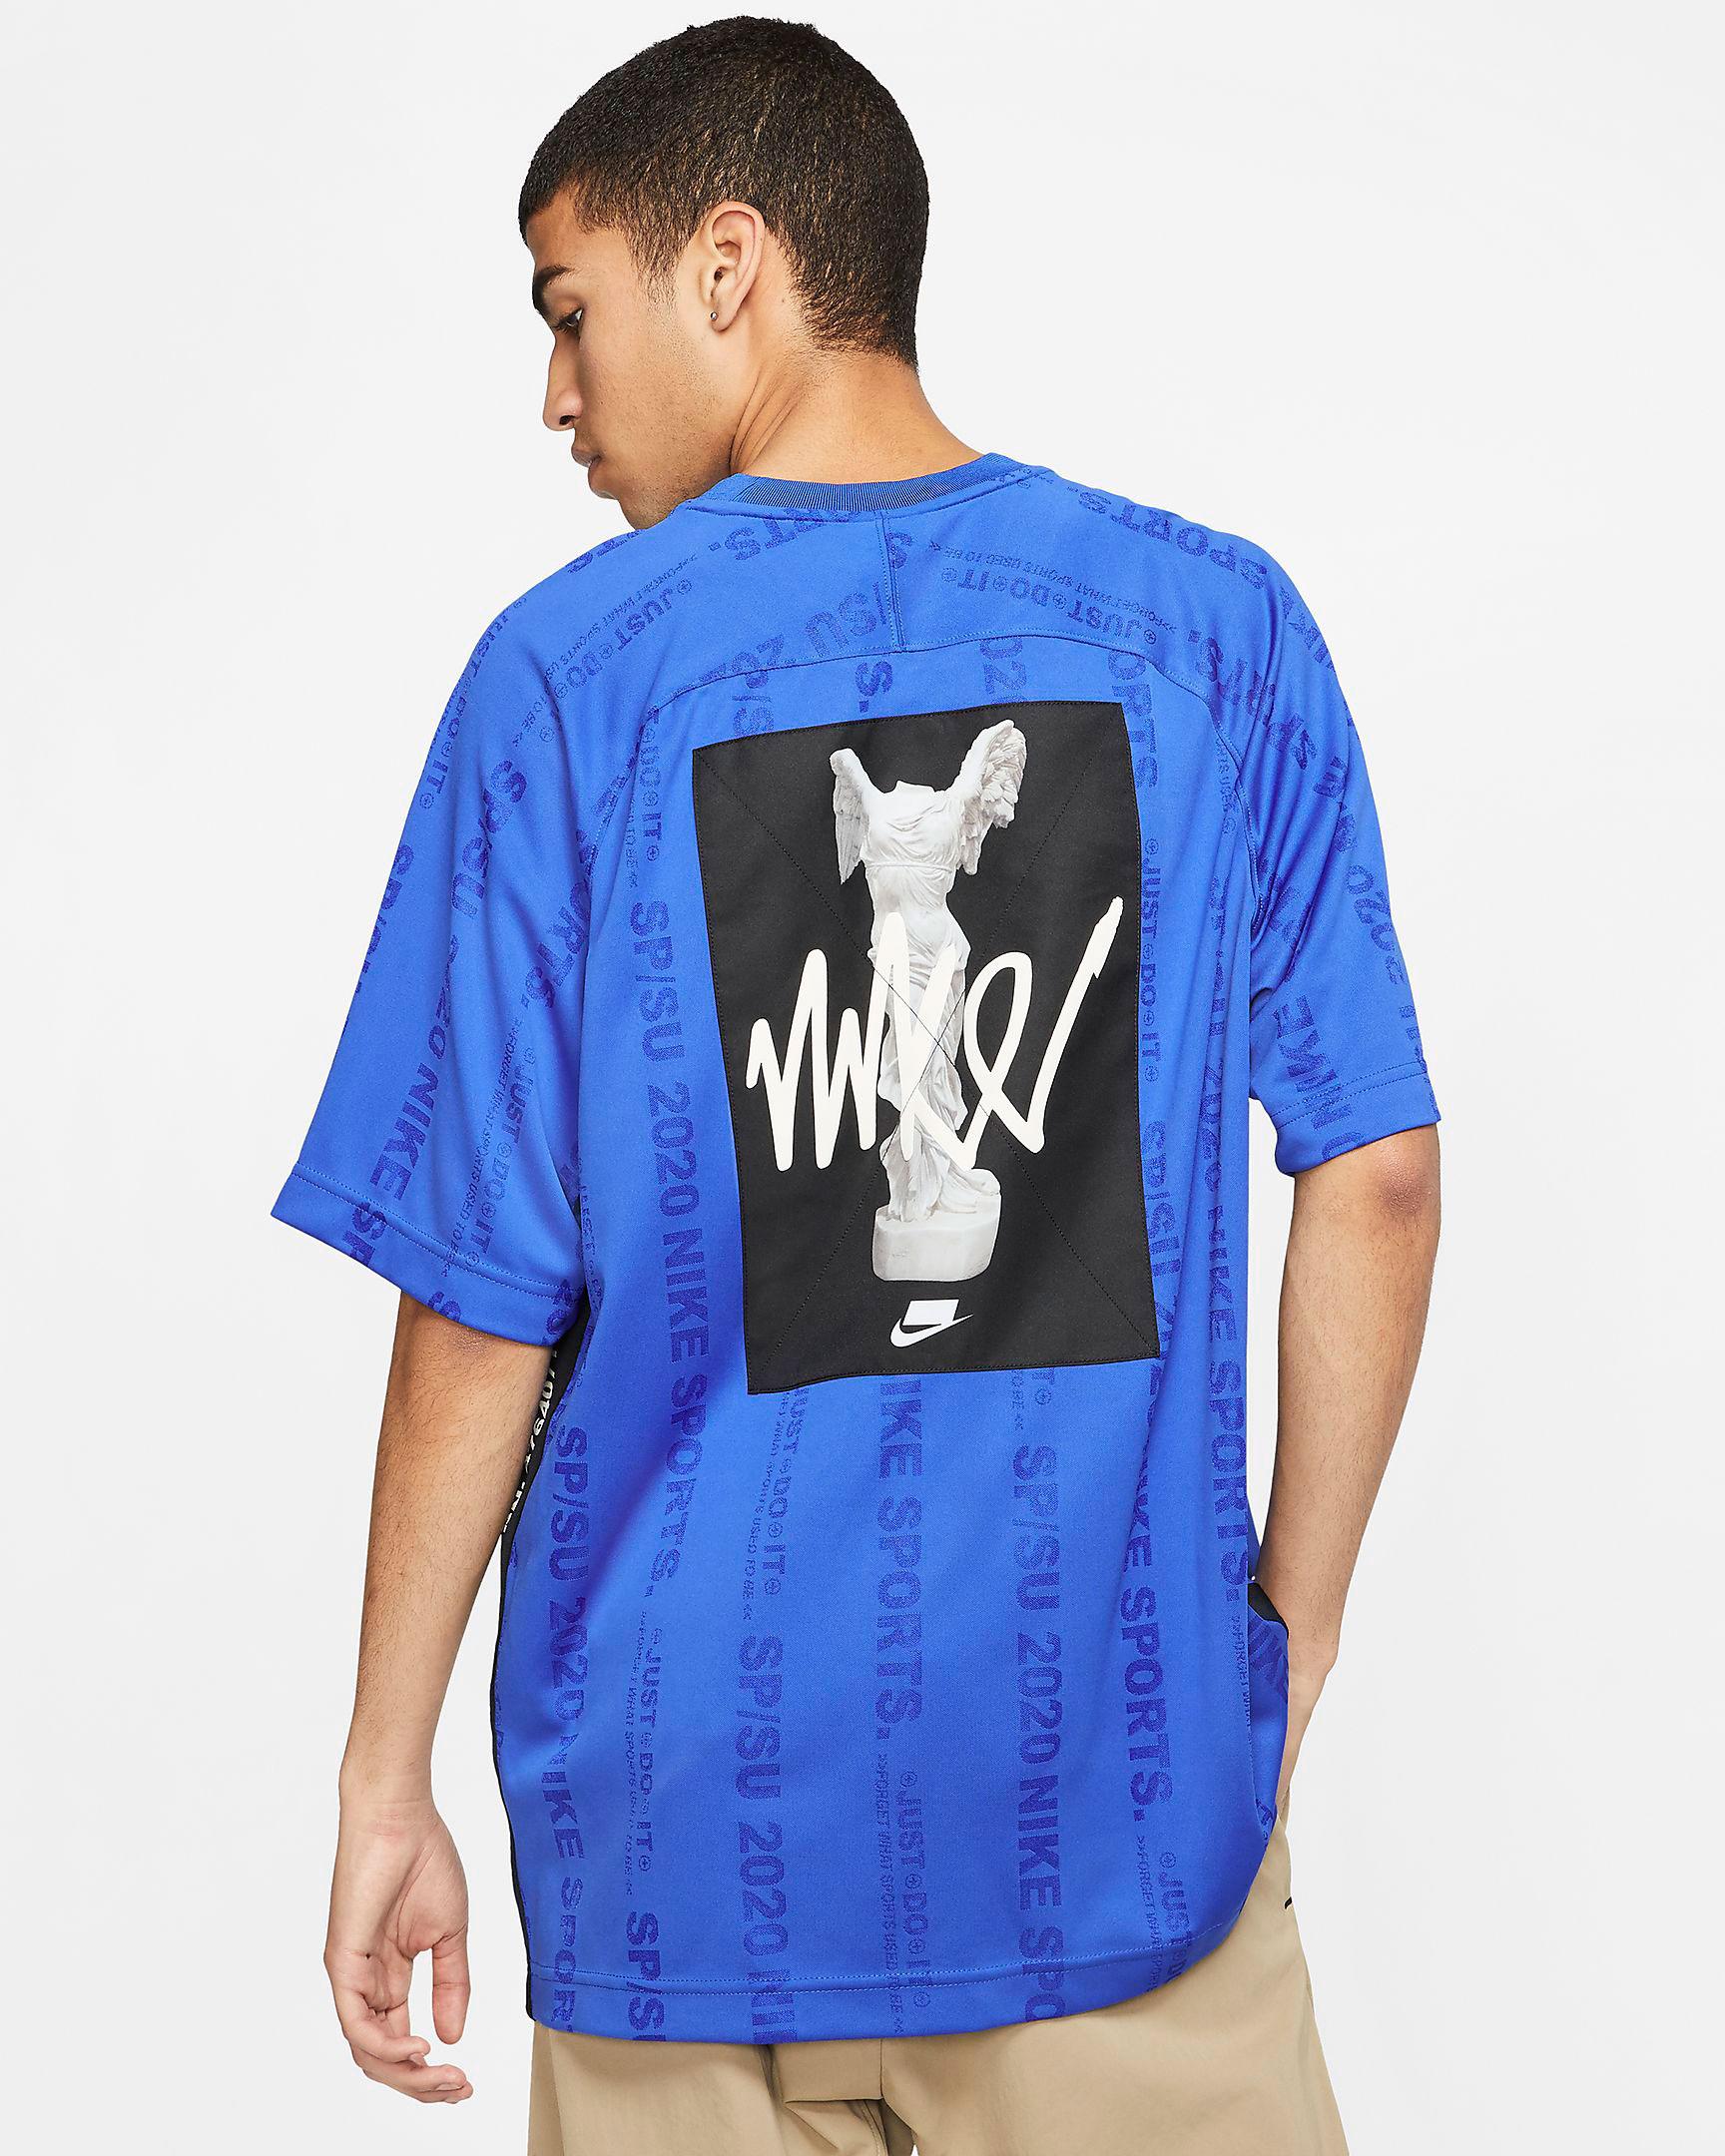 nike-sportswear-flame-swoosh-shirt-2